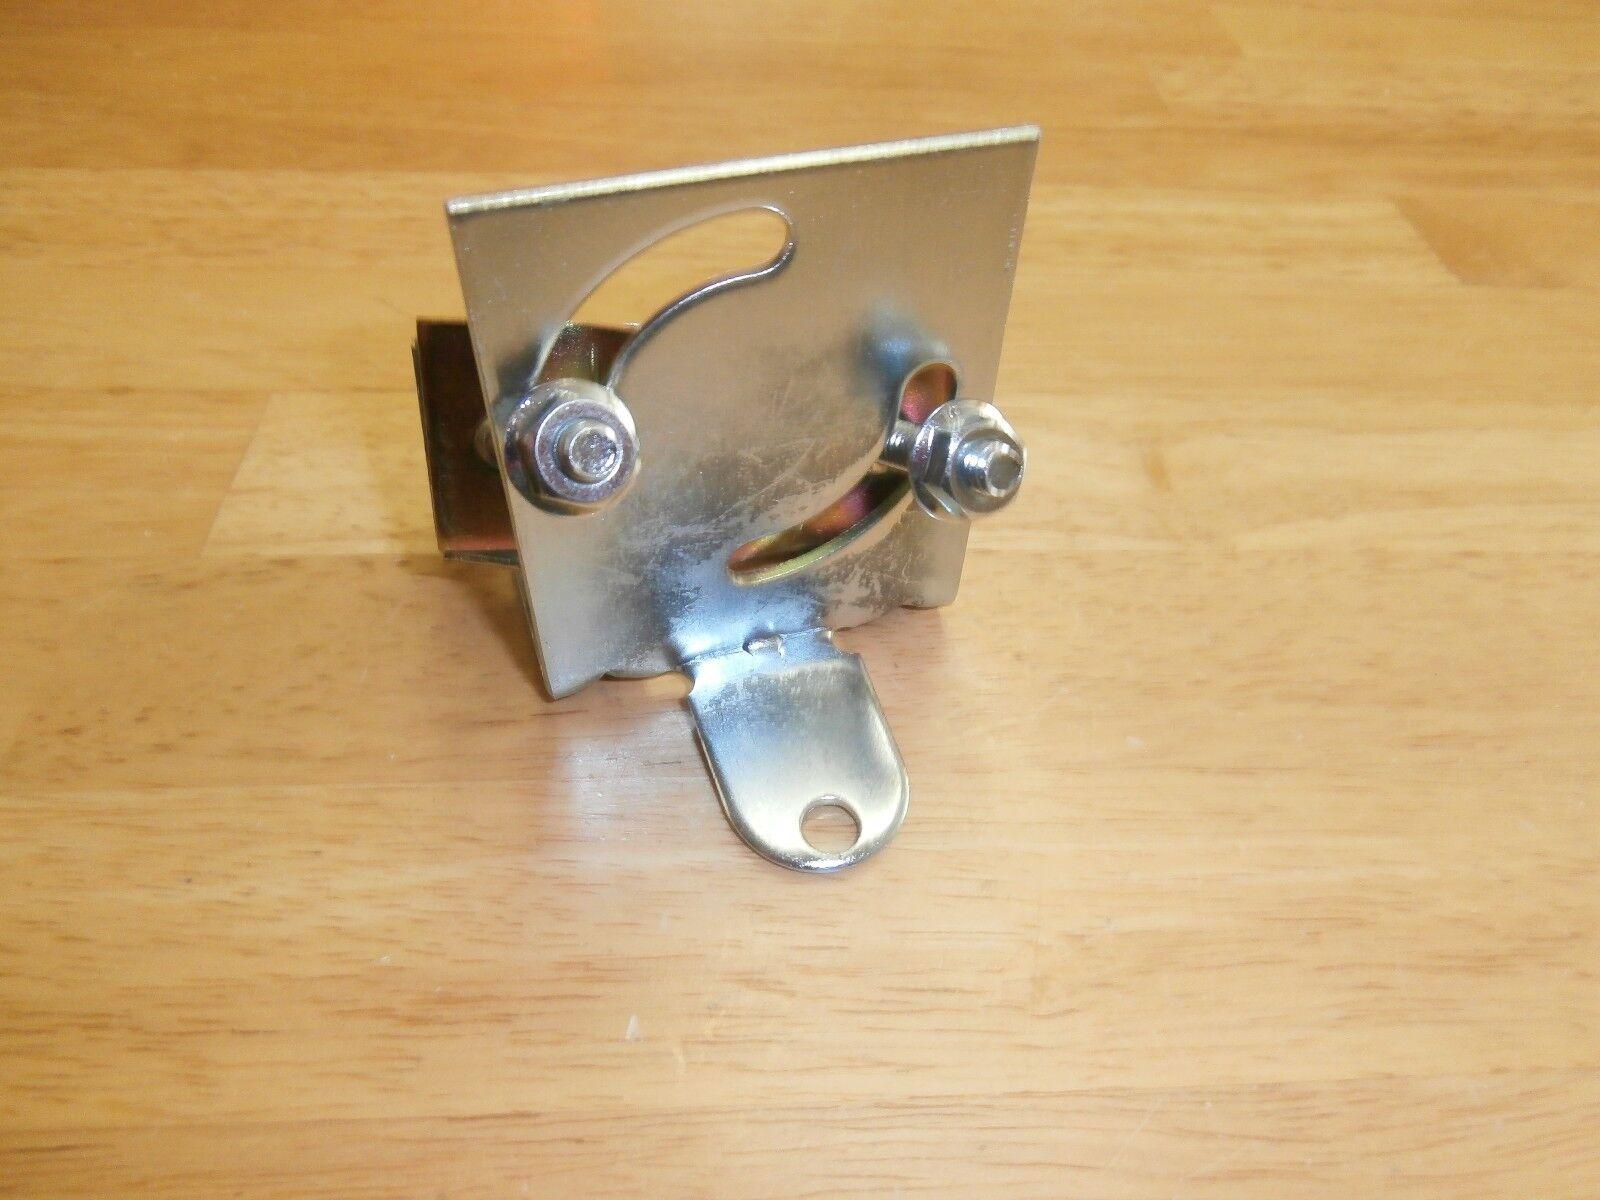 GC ELECTRONICS 8800-U WALDOM HANDY MOUNT ANTENNA MAST CLAMP BRACKET